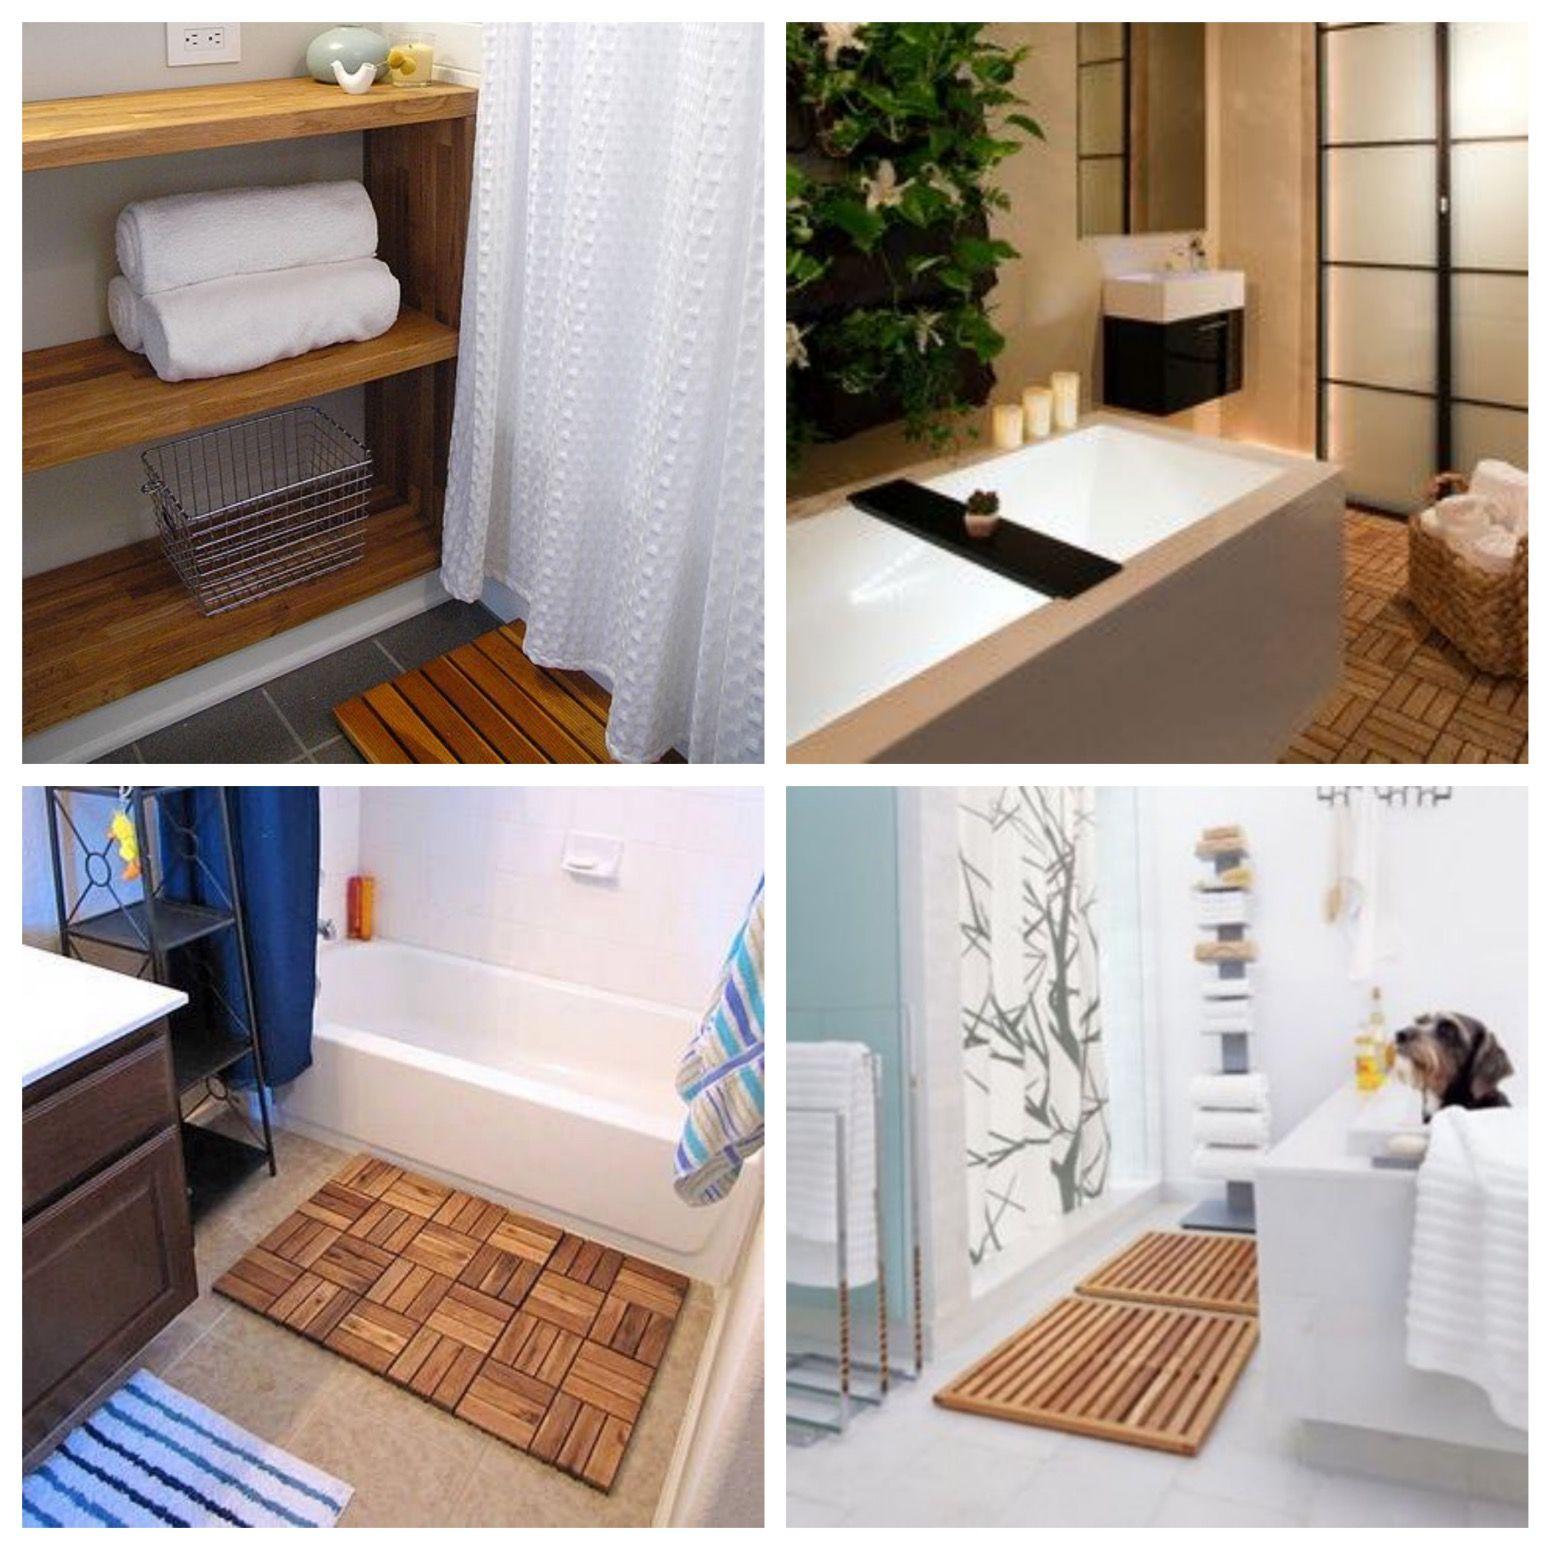 une salle de bain ikea hacks tuto diy pour la maison pinterest bathroom ikea et ikea hack. Black Bedroom Furniture Sets. Home Design Ideas